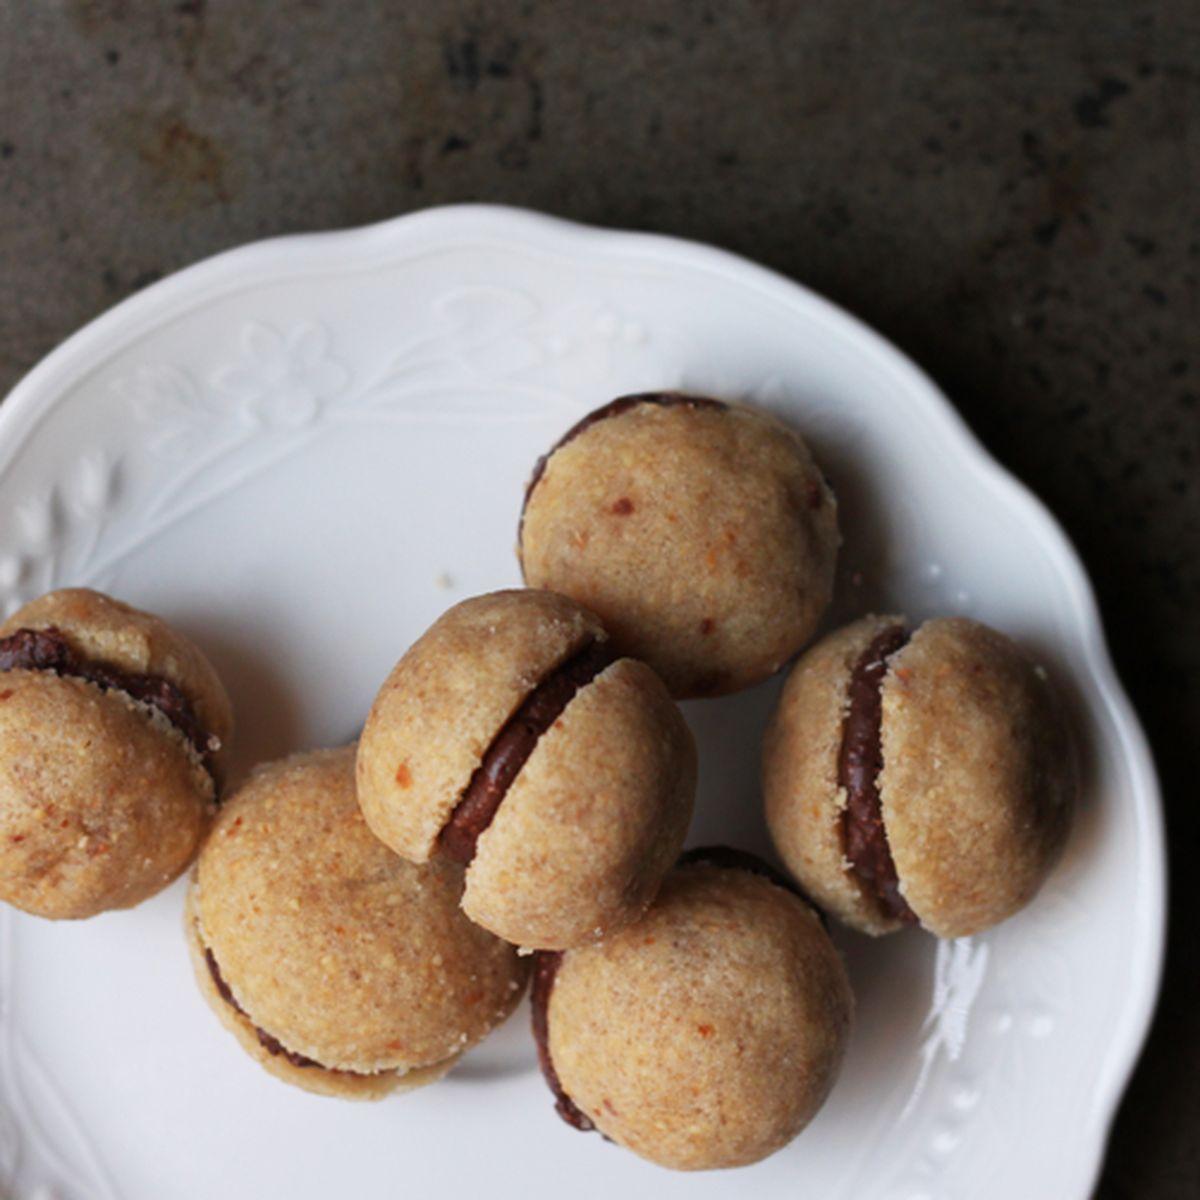 Baci Di Dama Chocolate Filled Hazelnut Cookies Recipe On Food52 Signora Snack Maker